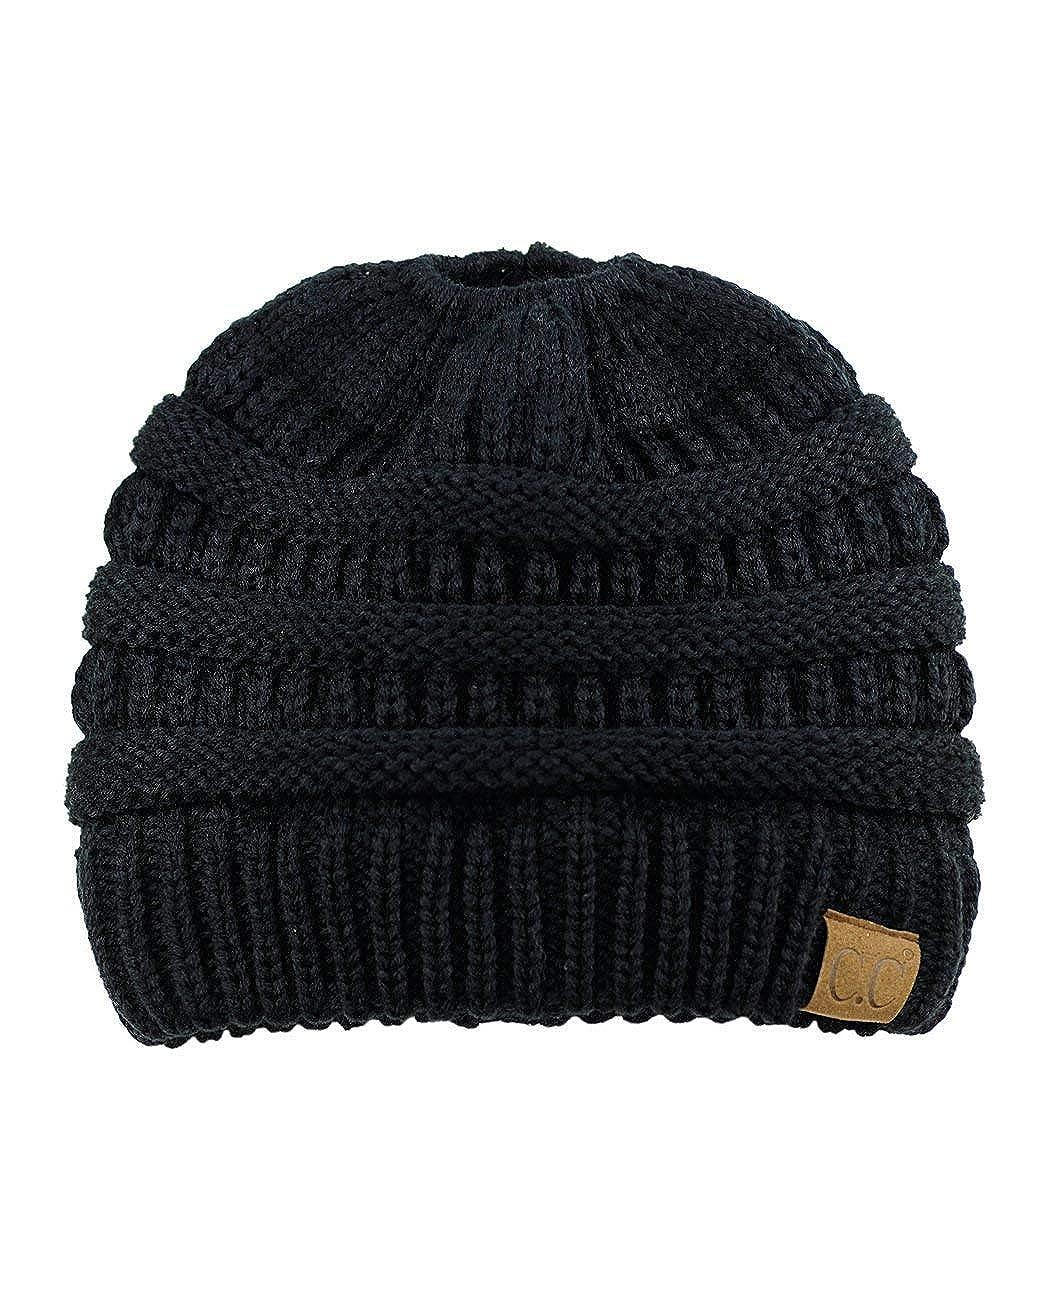 67d214b64eadfe 3D-Star C.C Trendy Warm Chunky Soft Stretch Cable Knit Beanie Skully